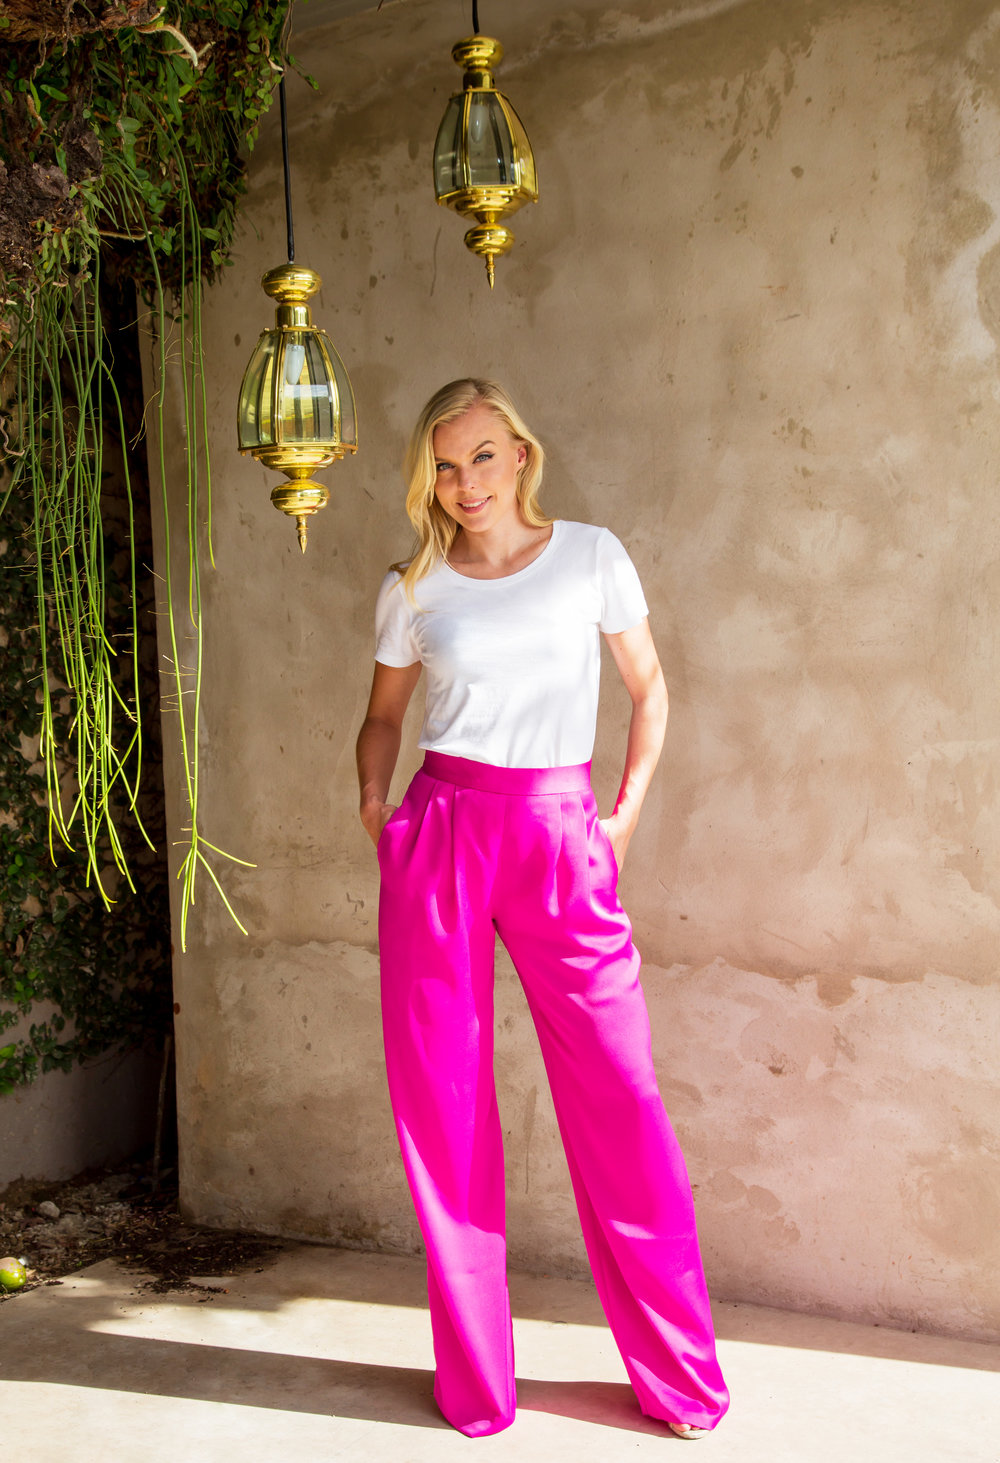 JENNY_RAGNHIL_Pinkpants+tshirt.jpg